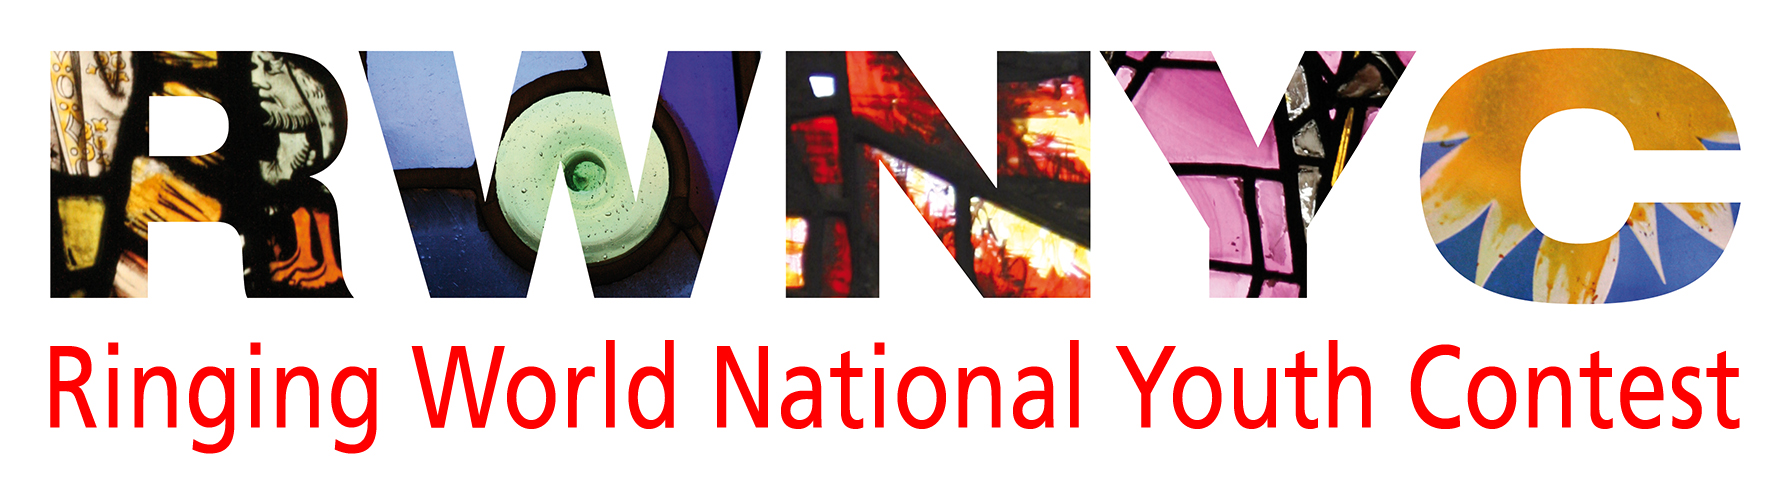 RWNYC Logo